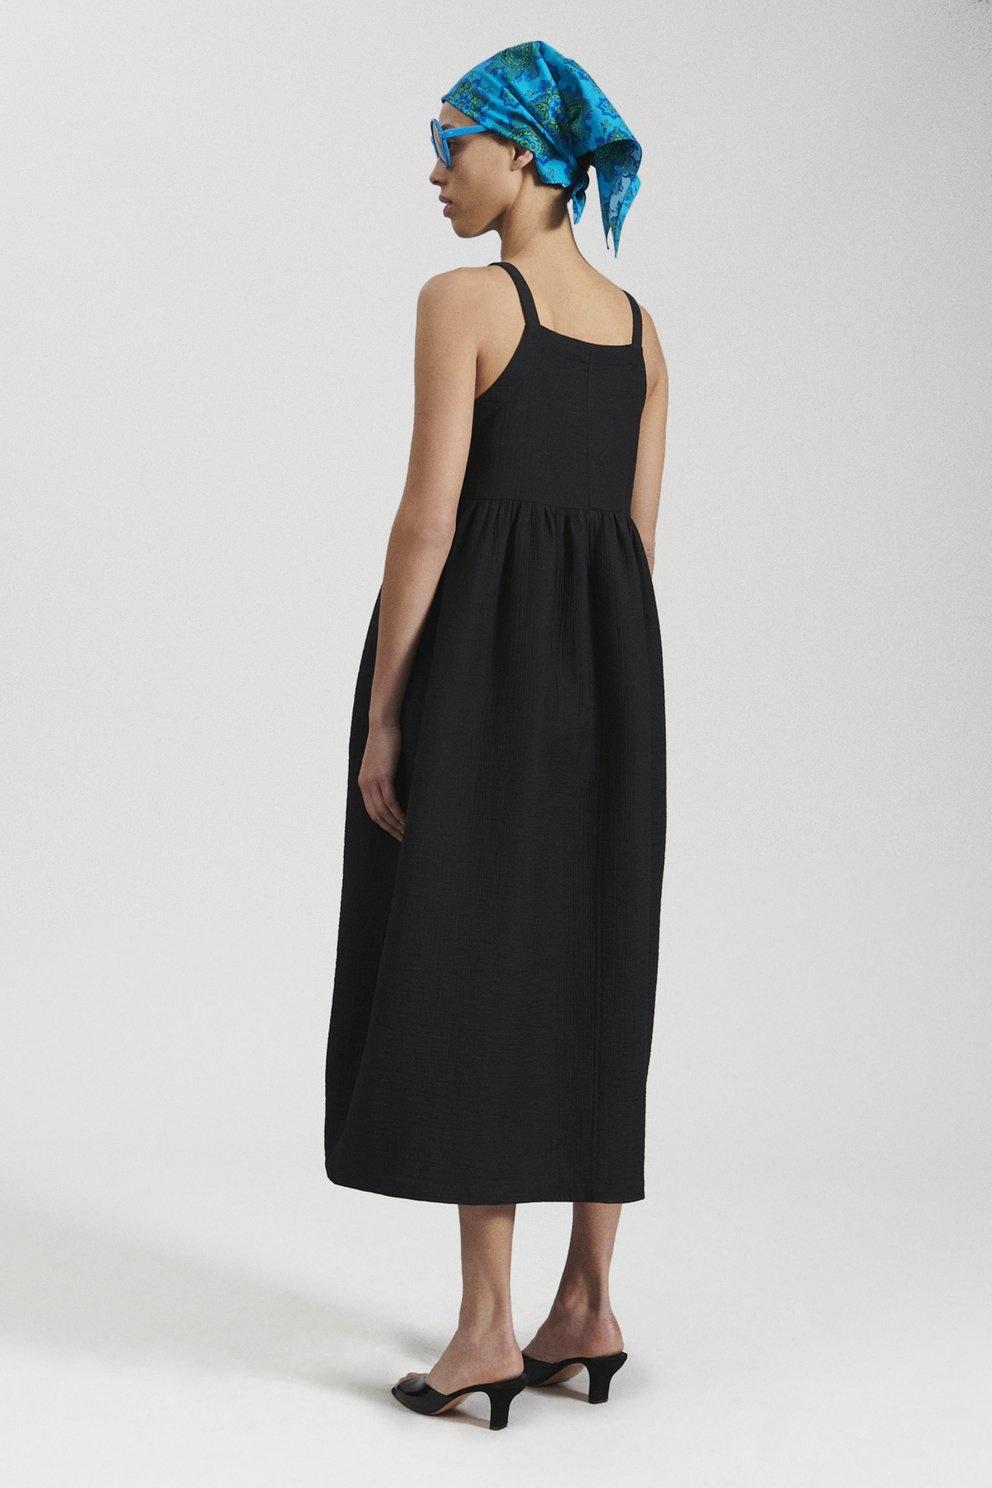 Fresco Dress Black